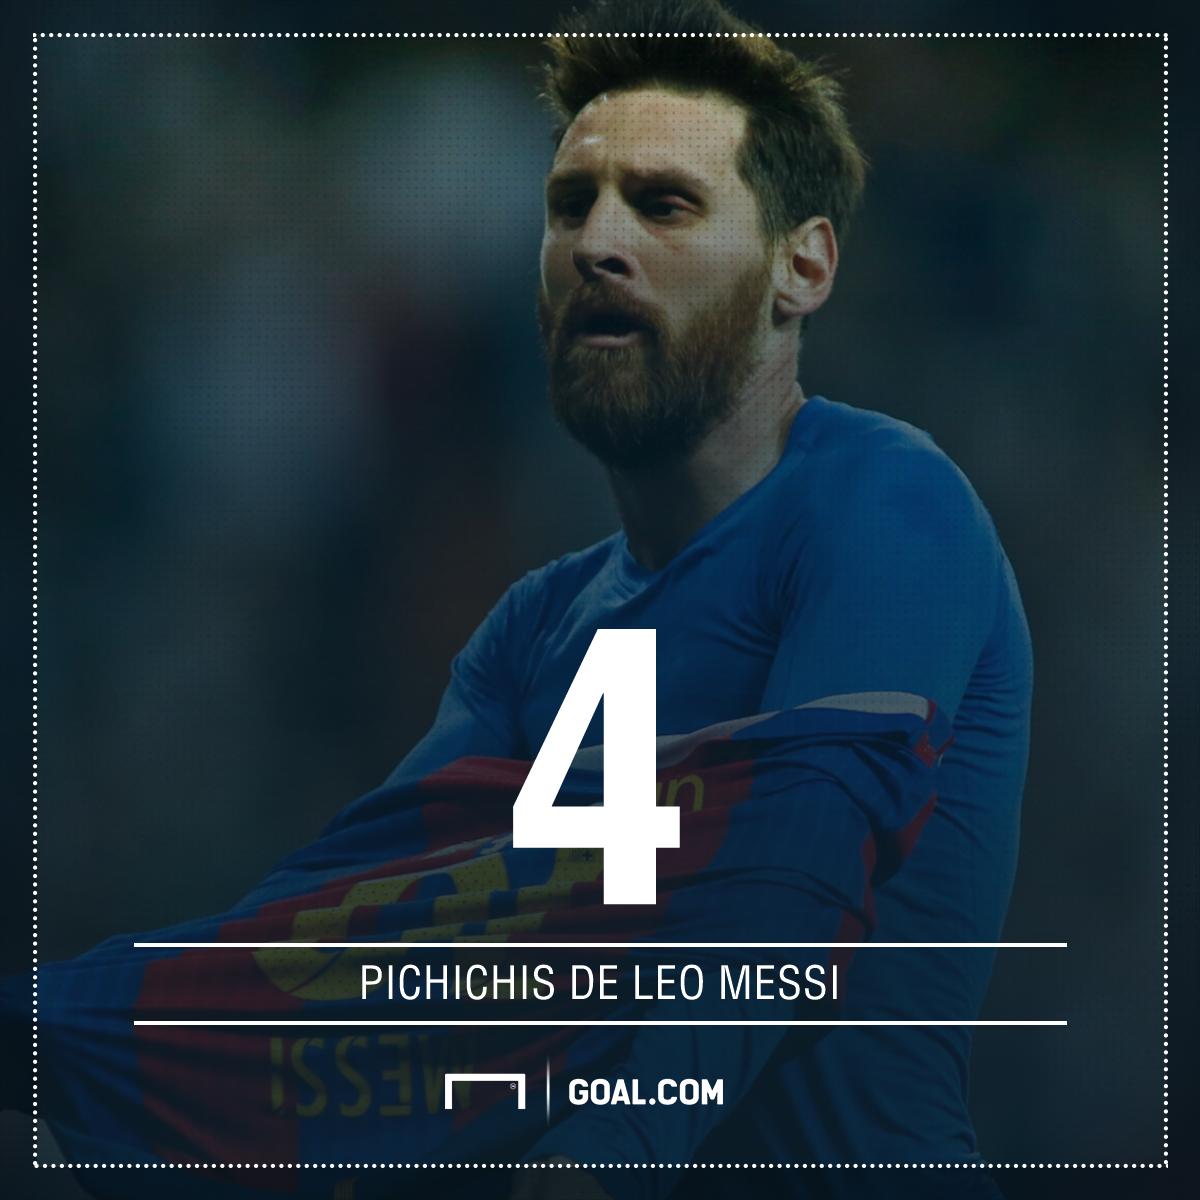 Messi Pichichi